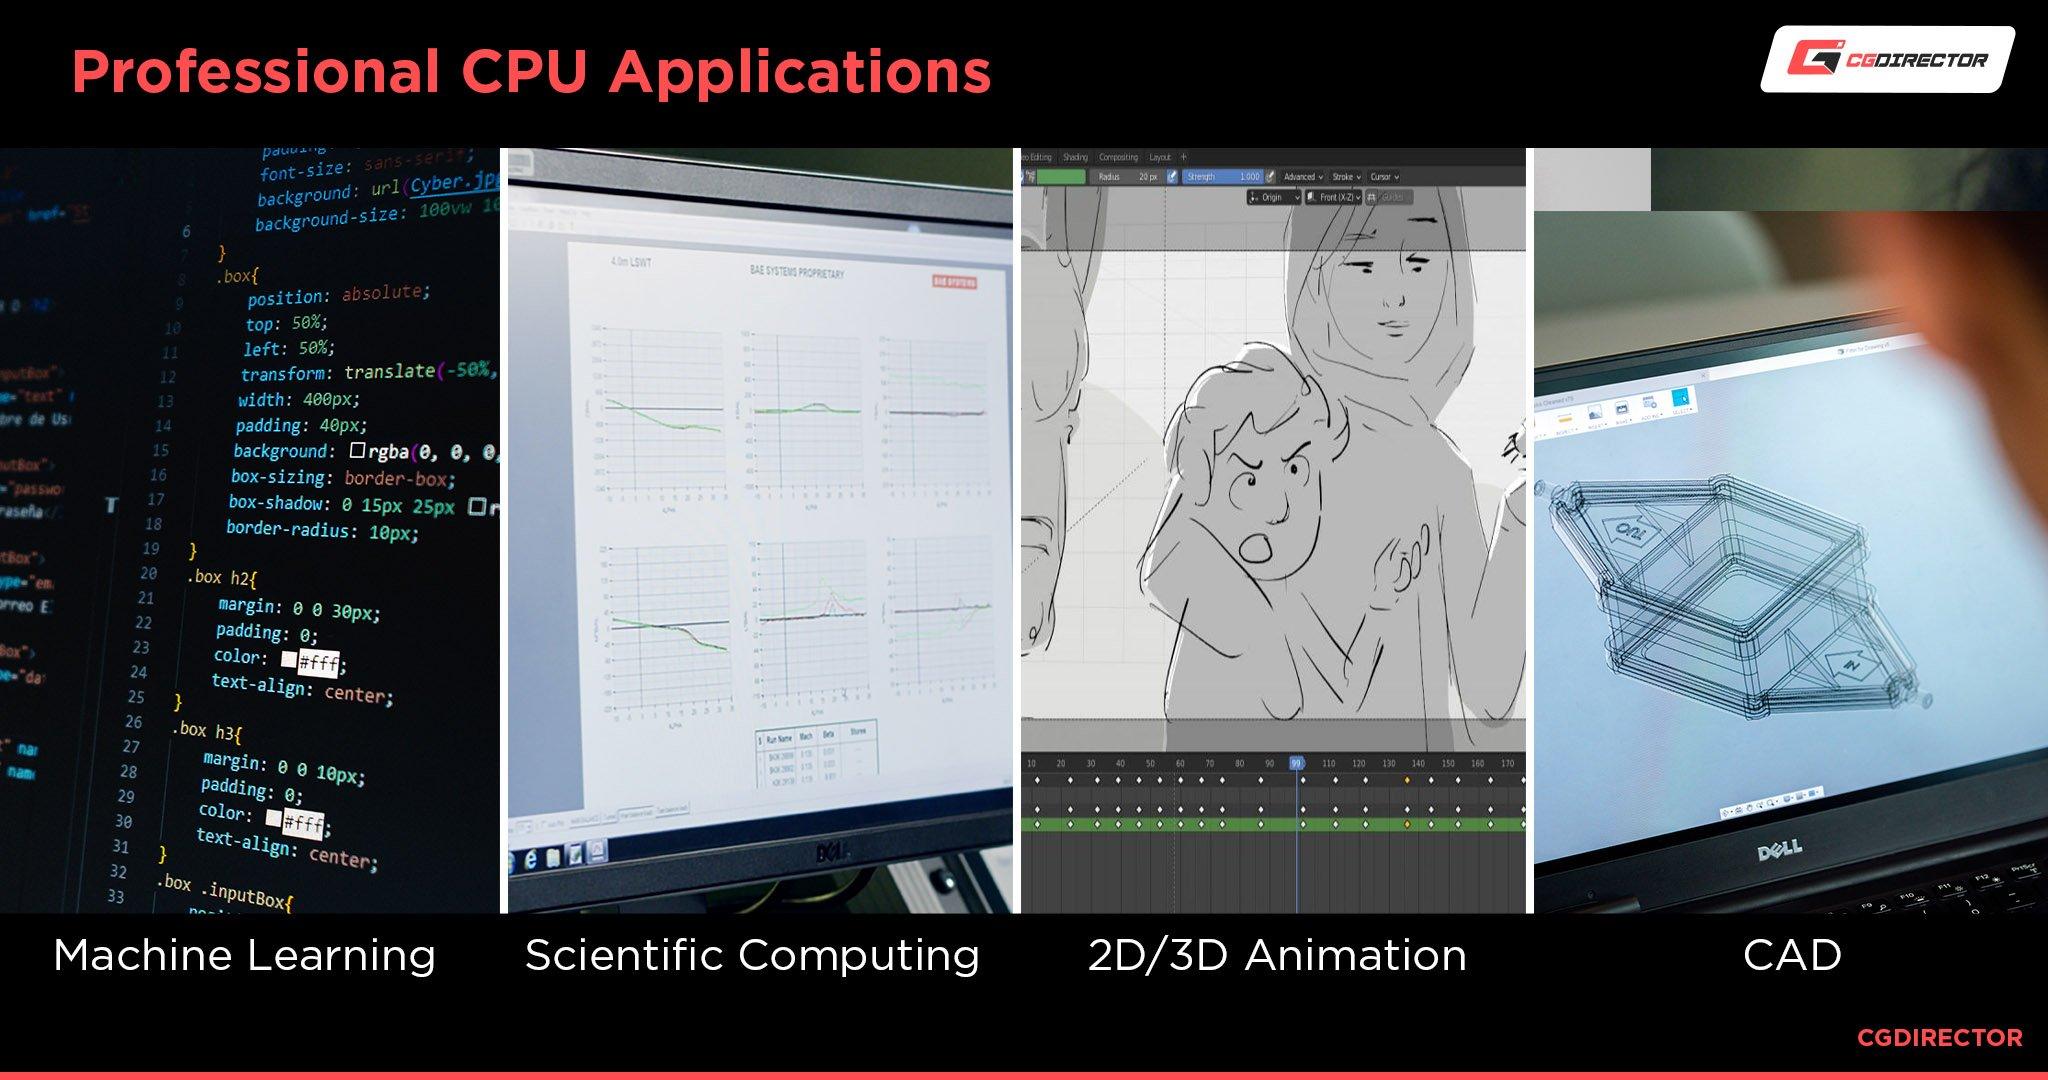 Professional CPU Applications